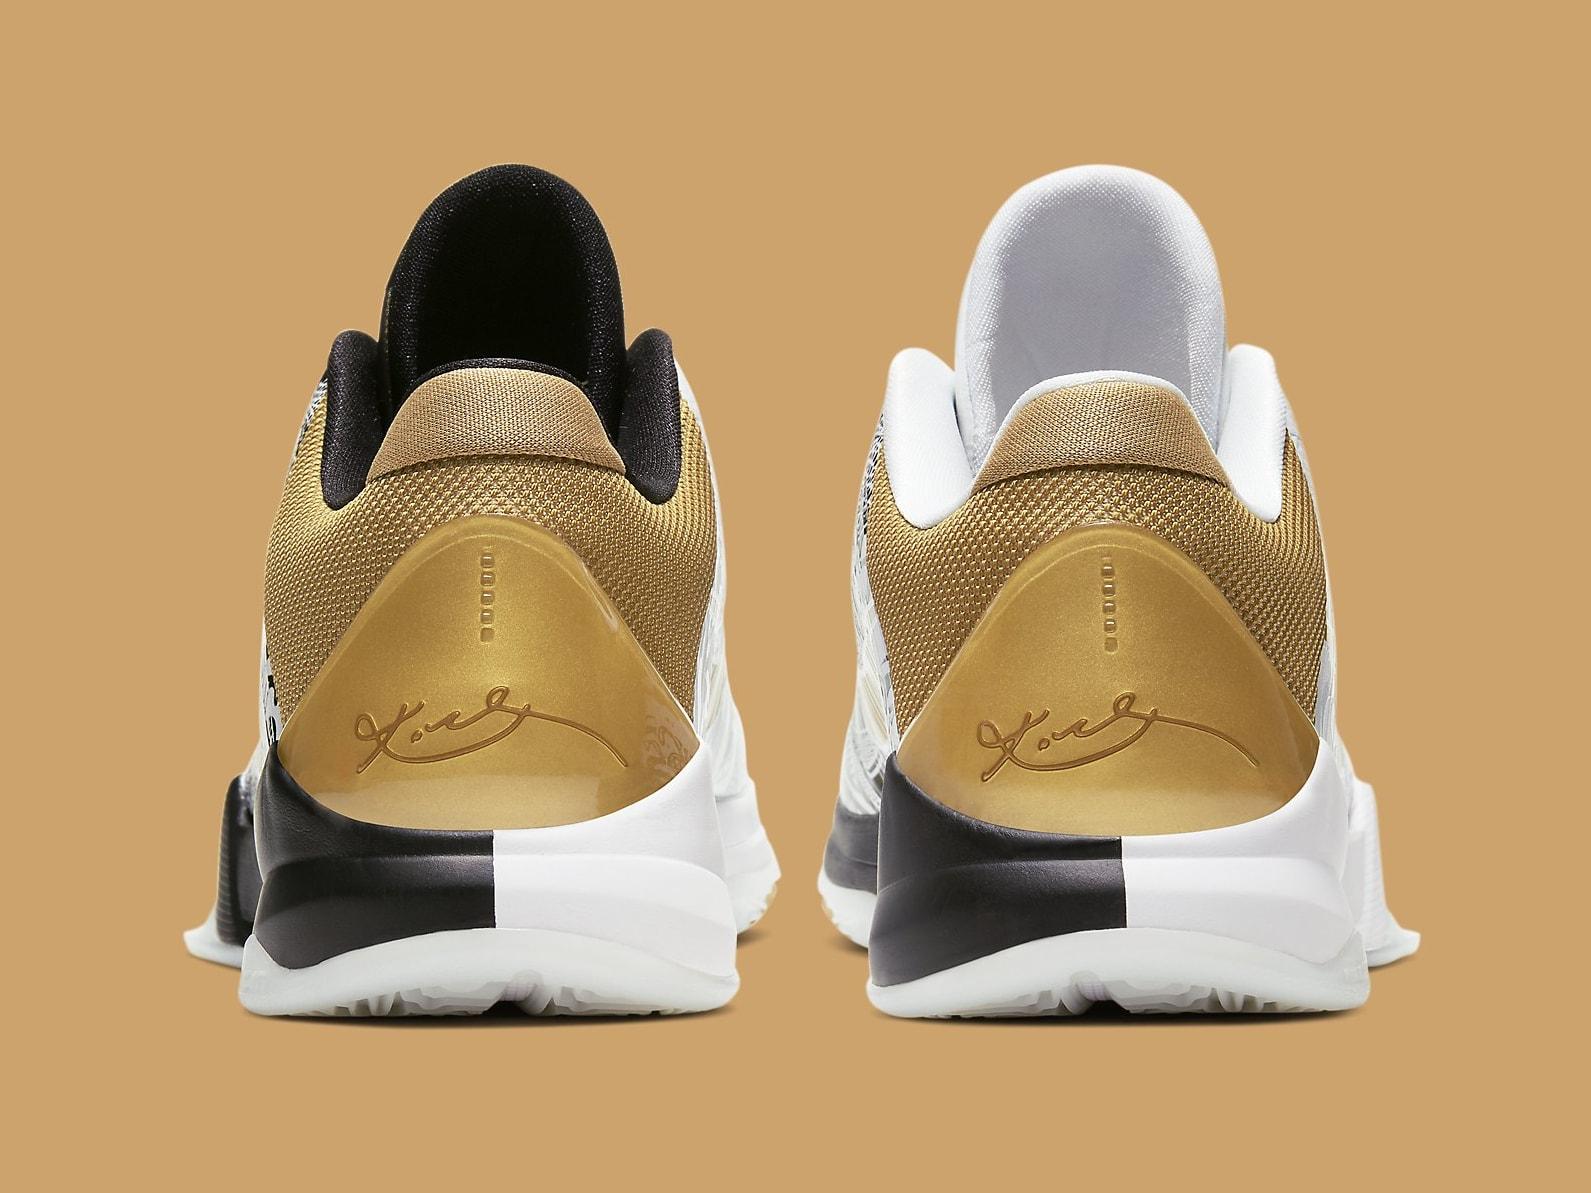 Nike Kobe 5 Big Stage Parade Release Date CT8014-100 Heel